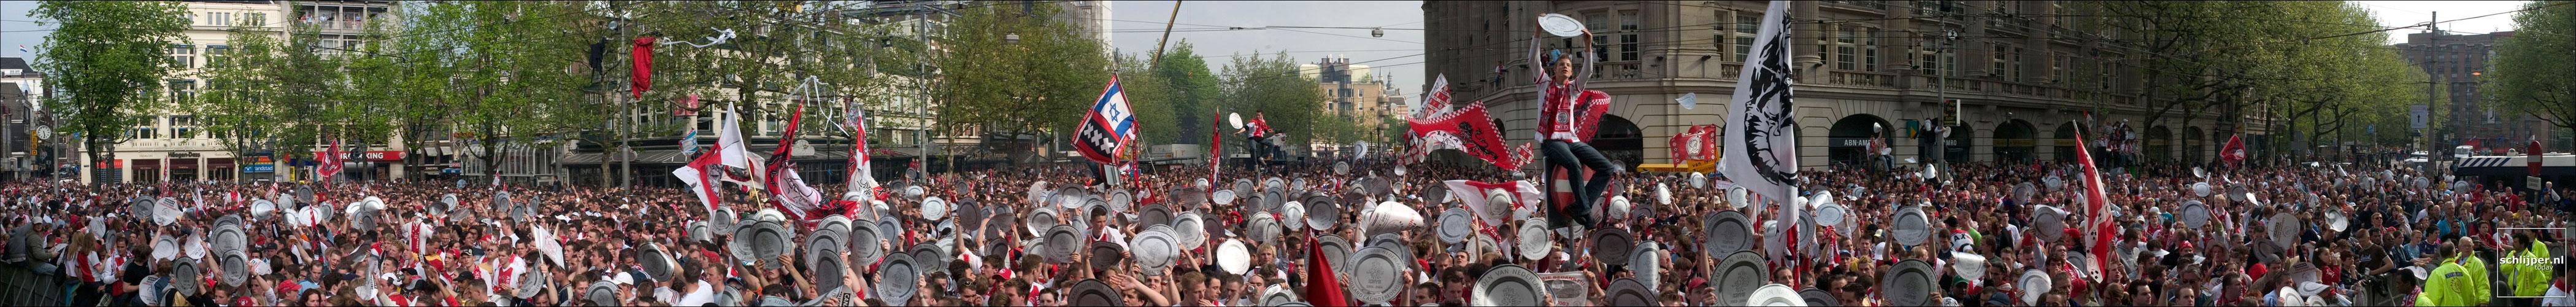 Nederland, Amsterdam, 9 mei 2004